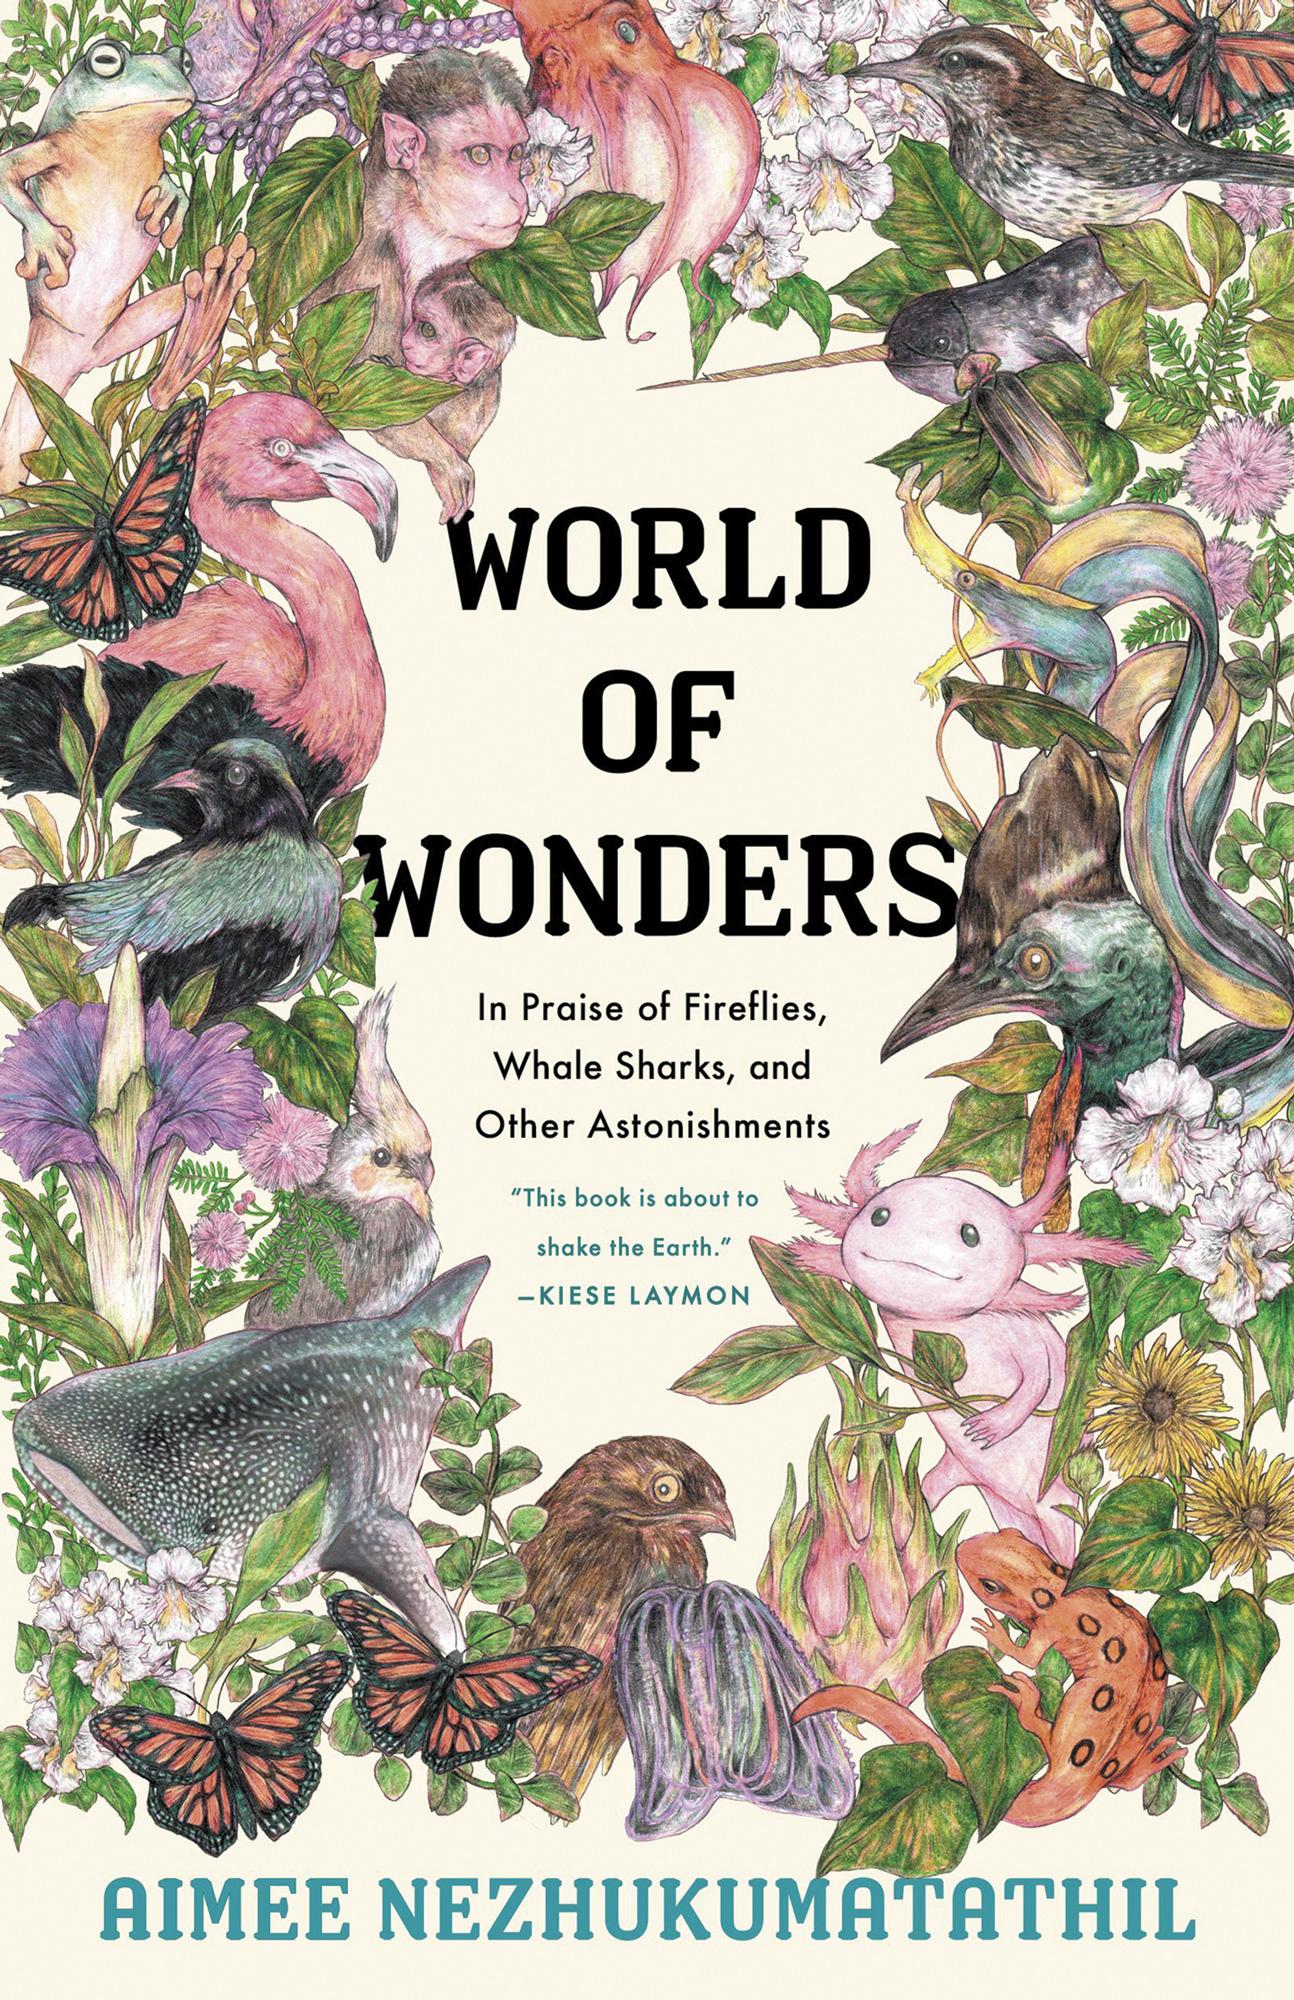 WorldOfWonders_BookClub_HanaZittel